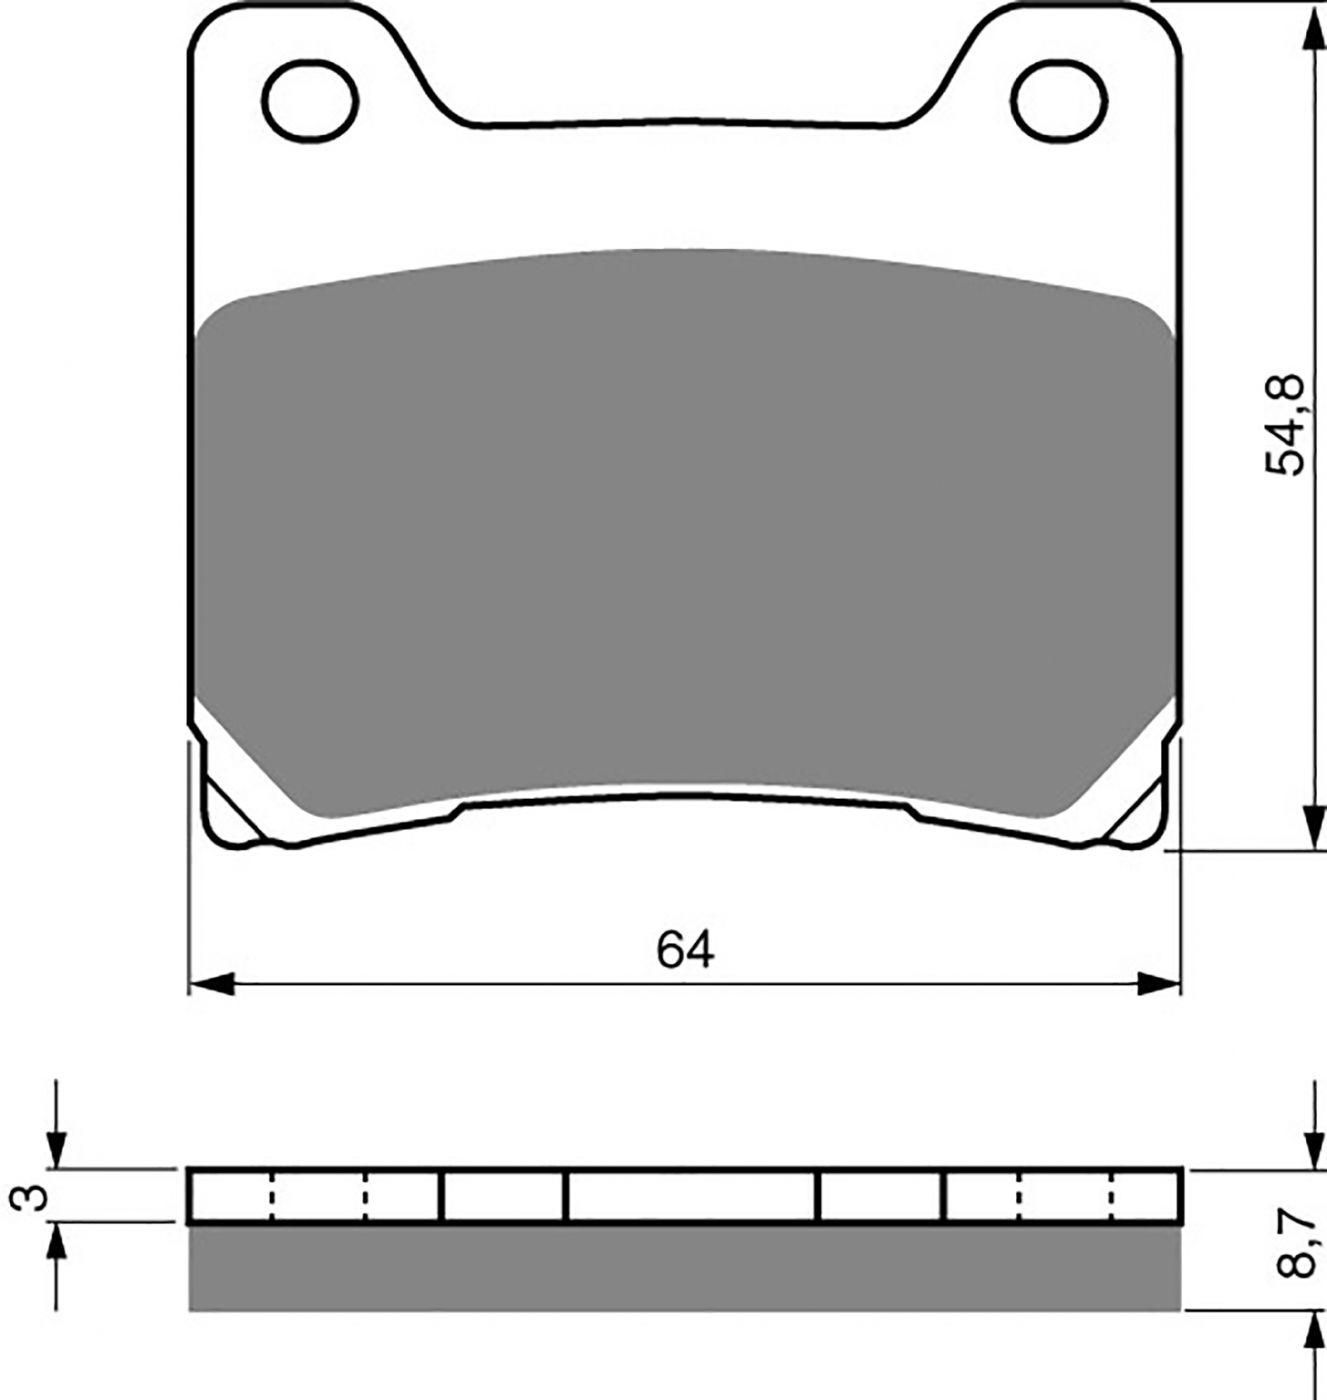 Goldfren S33 Brake Pads - 700015GS image